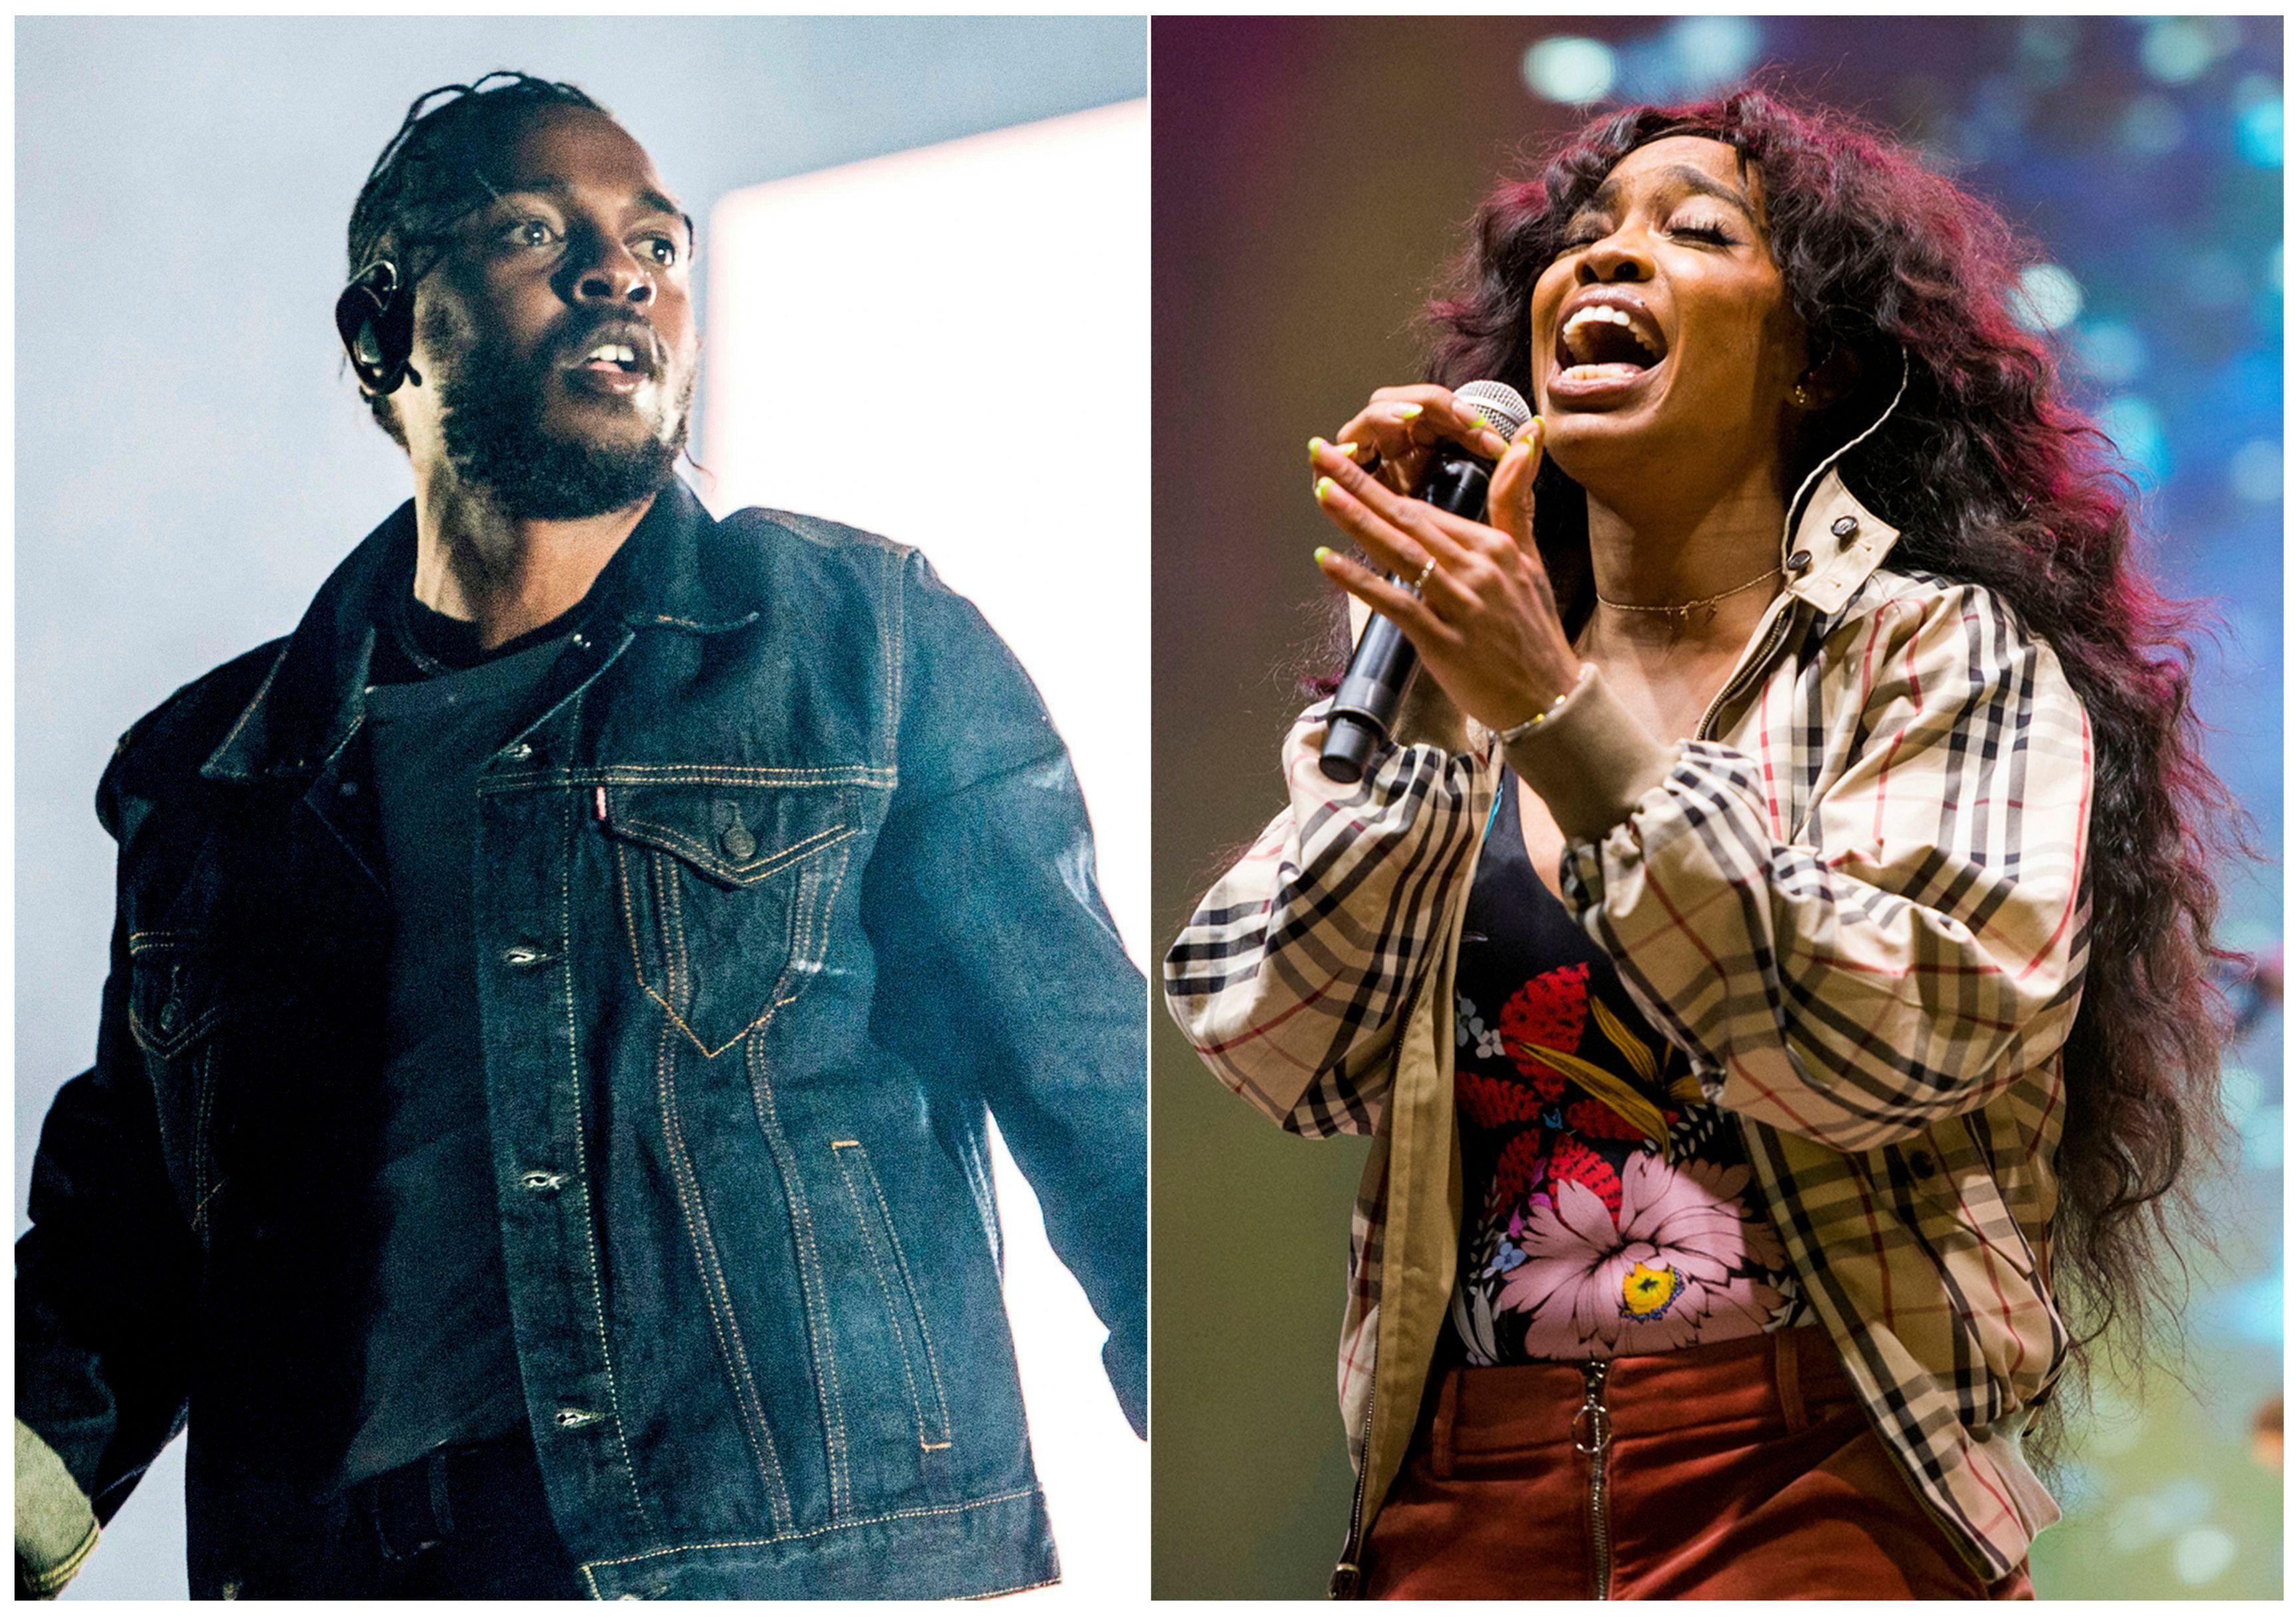 Kendrick Lamar, SZA Will Not Perform 'All the Stars' at 2019 Oscars